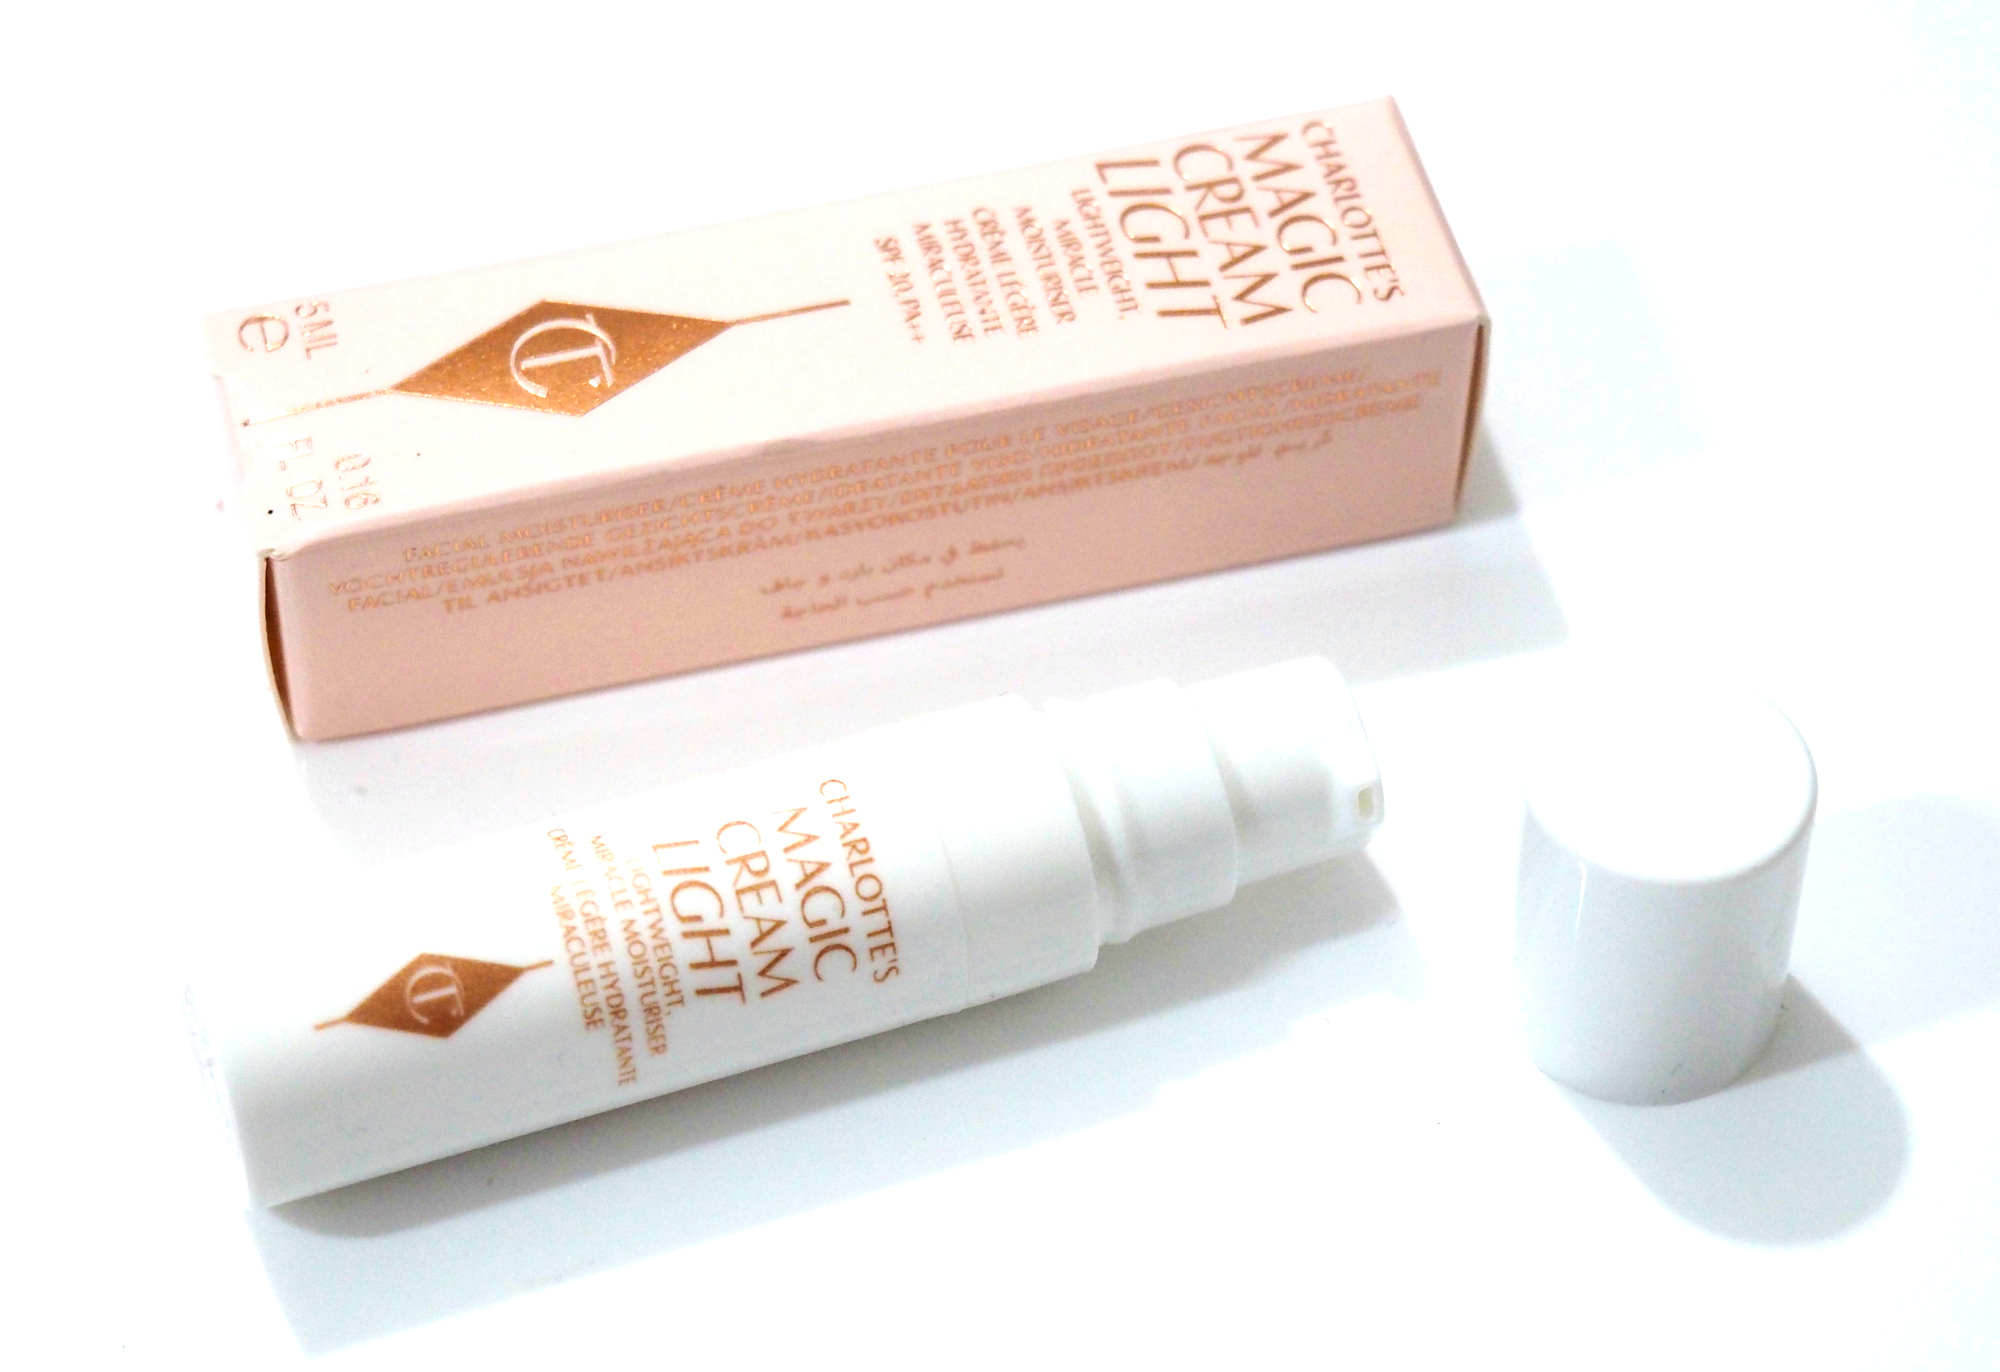 Charlotte Tilbury Charlotte's Magic Cream Light Review